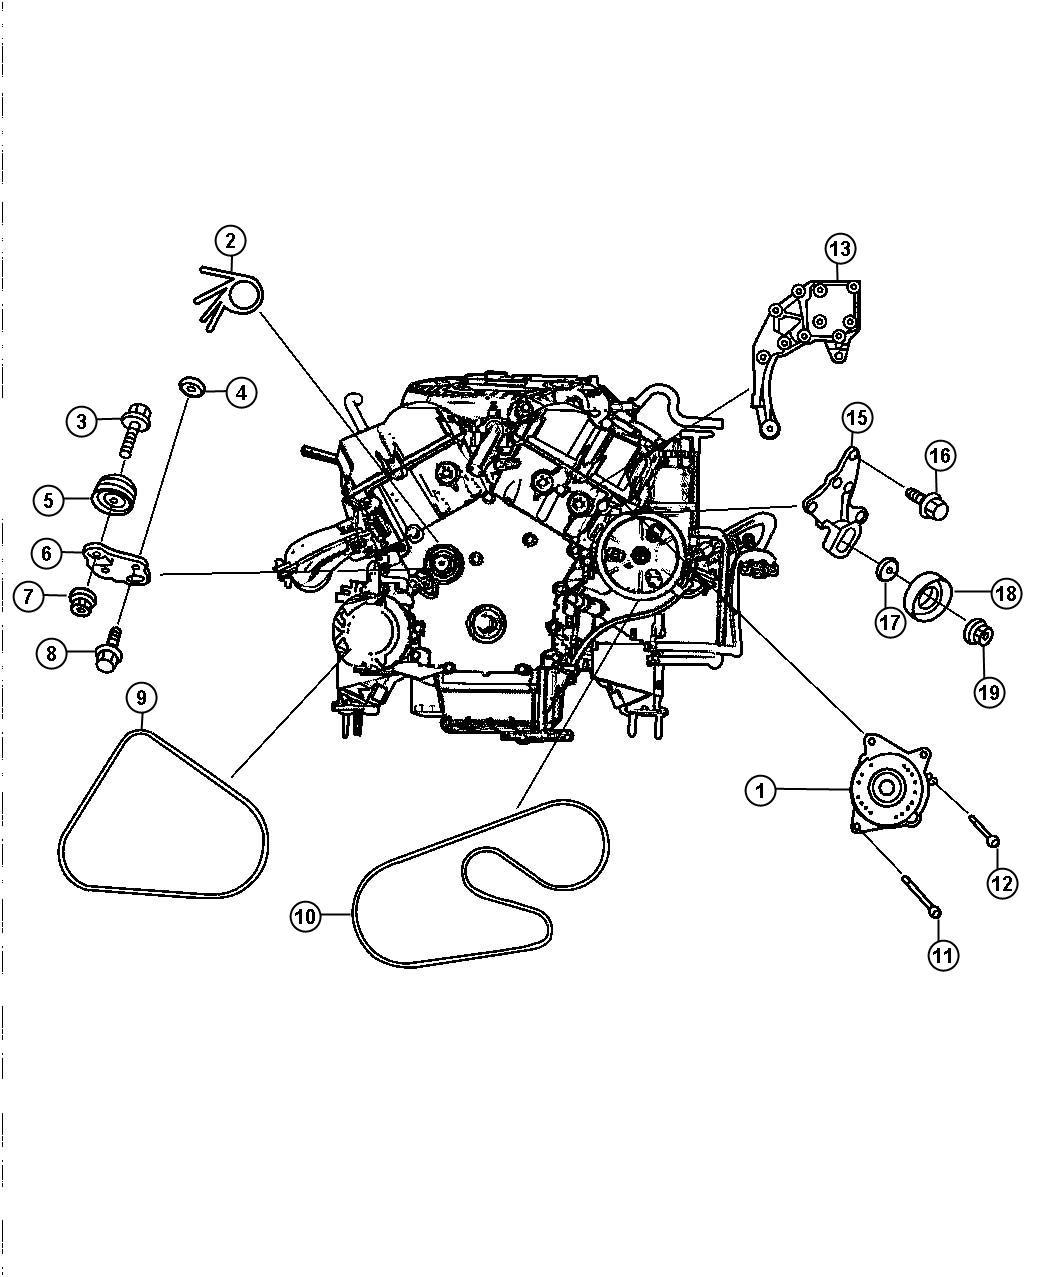 Dodge Intrepid Belt. Used for: alt. And power steering